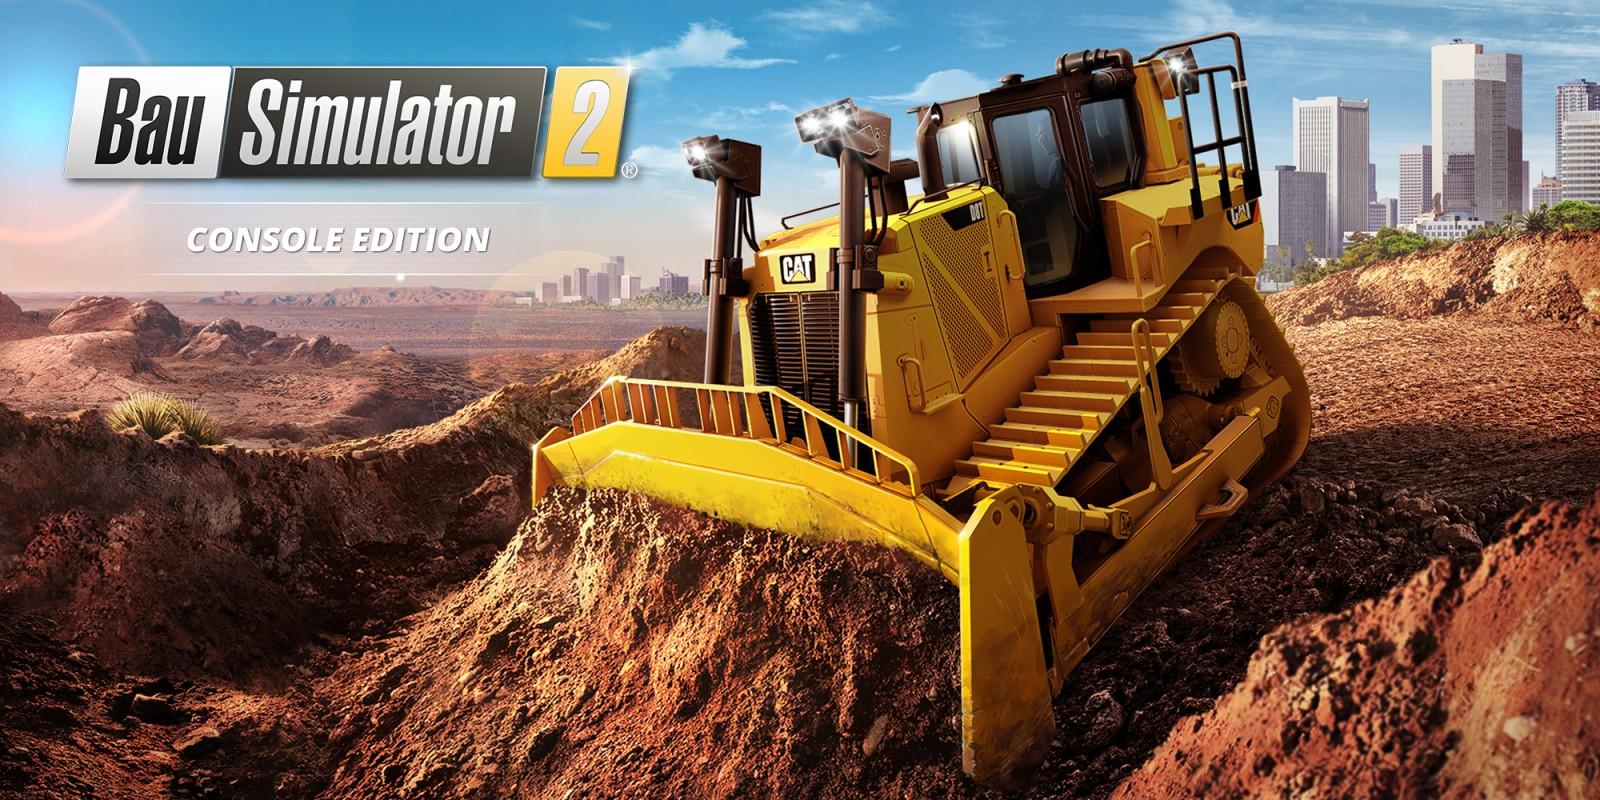 Bau-Simulator 2 US - Console Edition